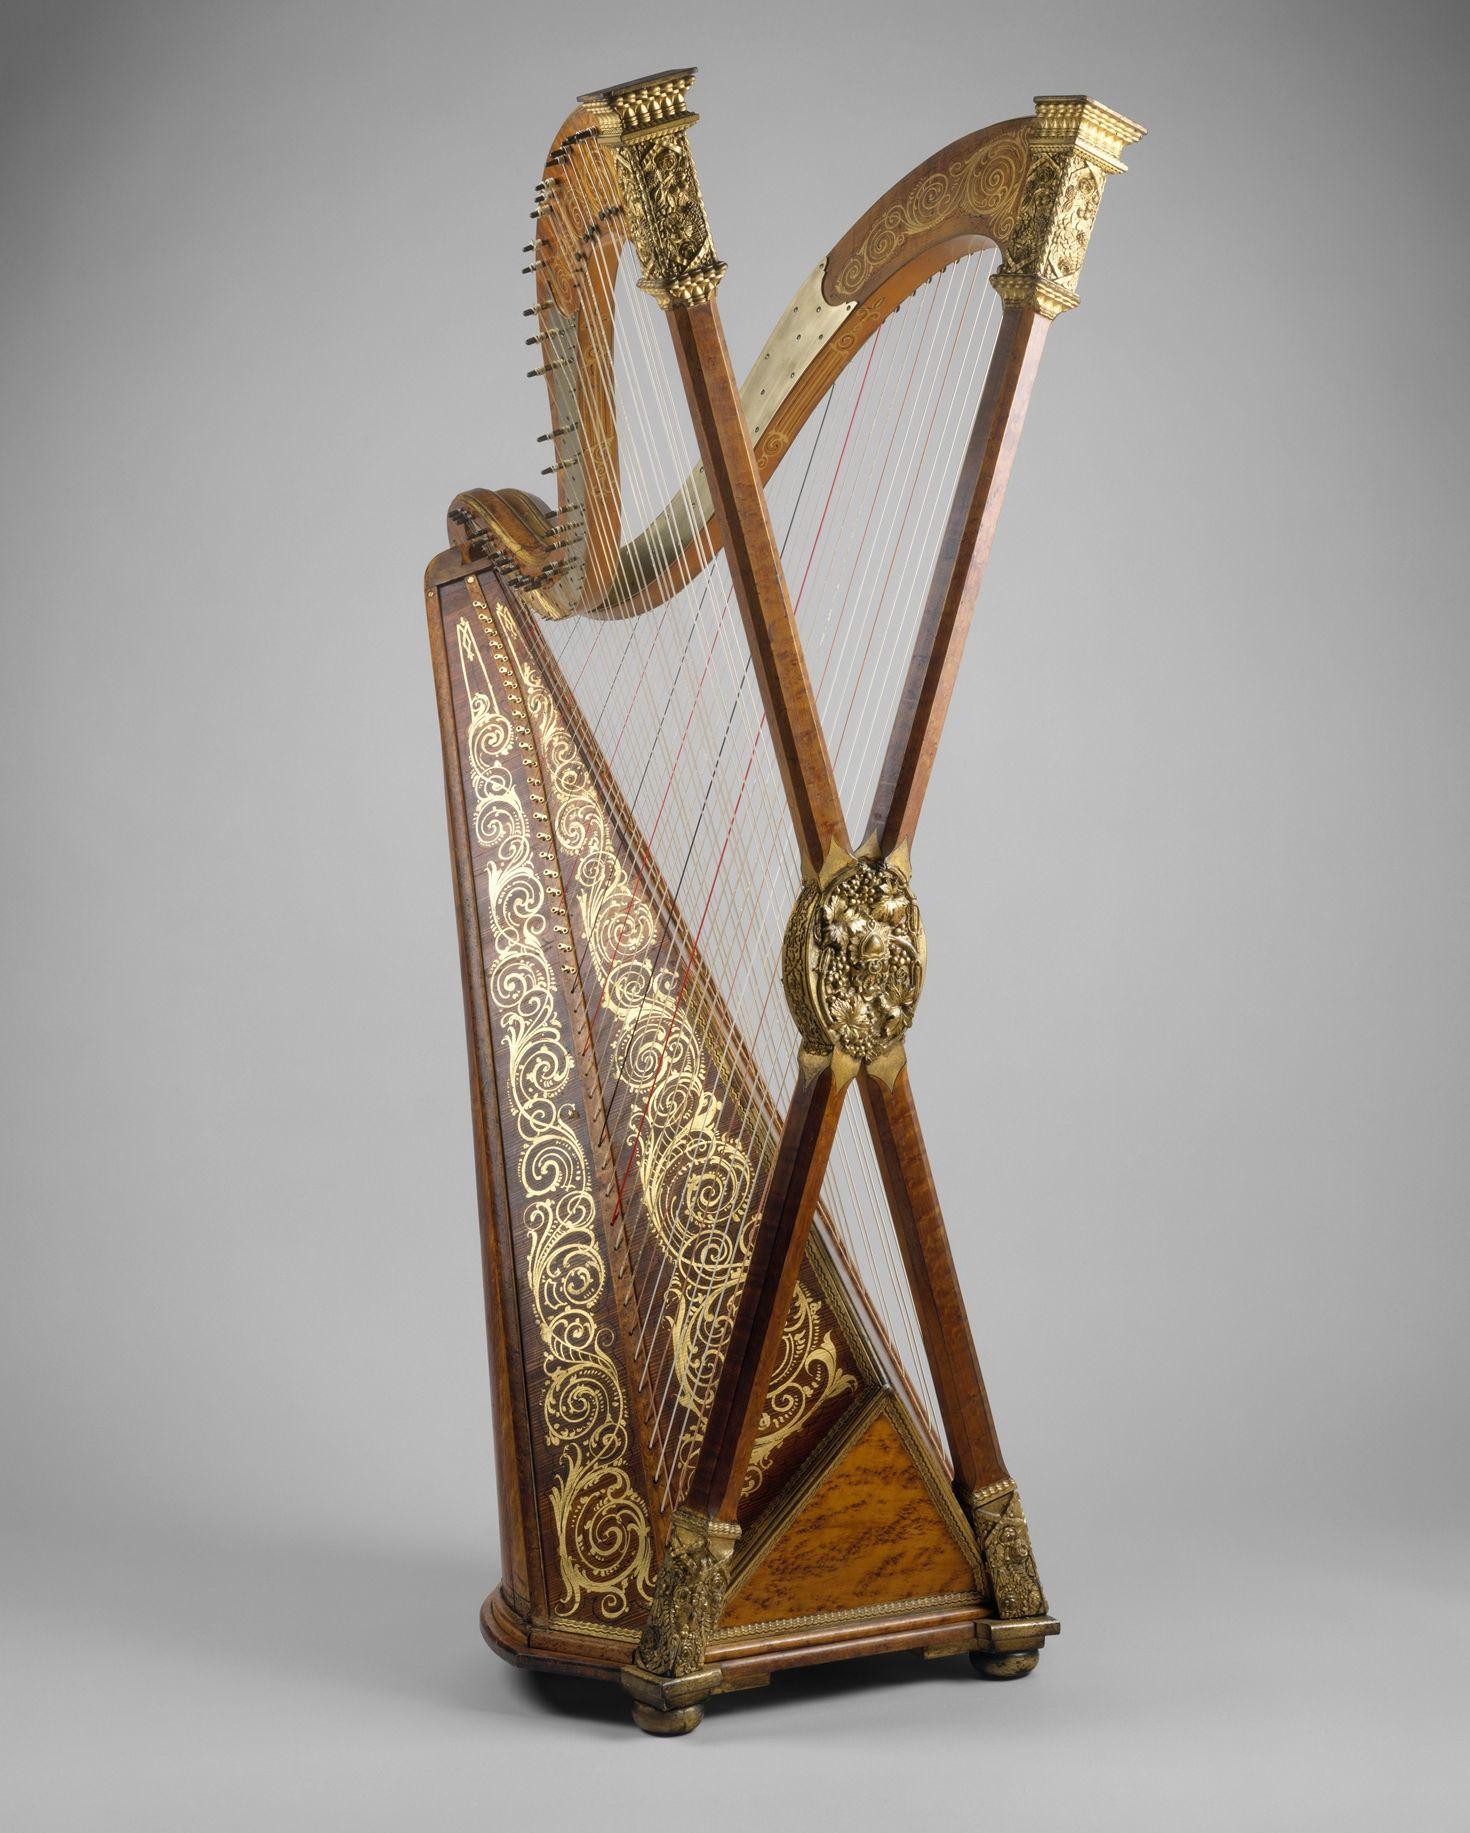 Datei:Double Chromatic Harp MET dt10862a.jpg